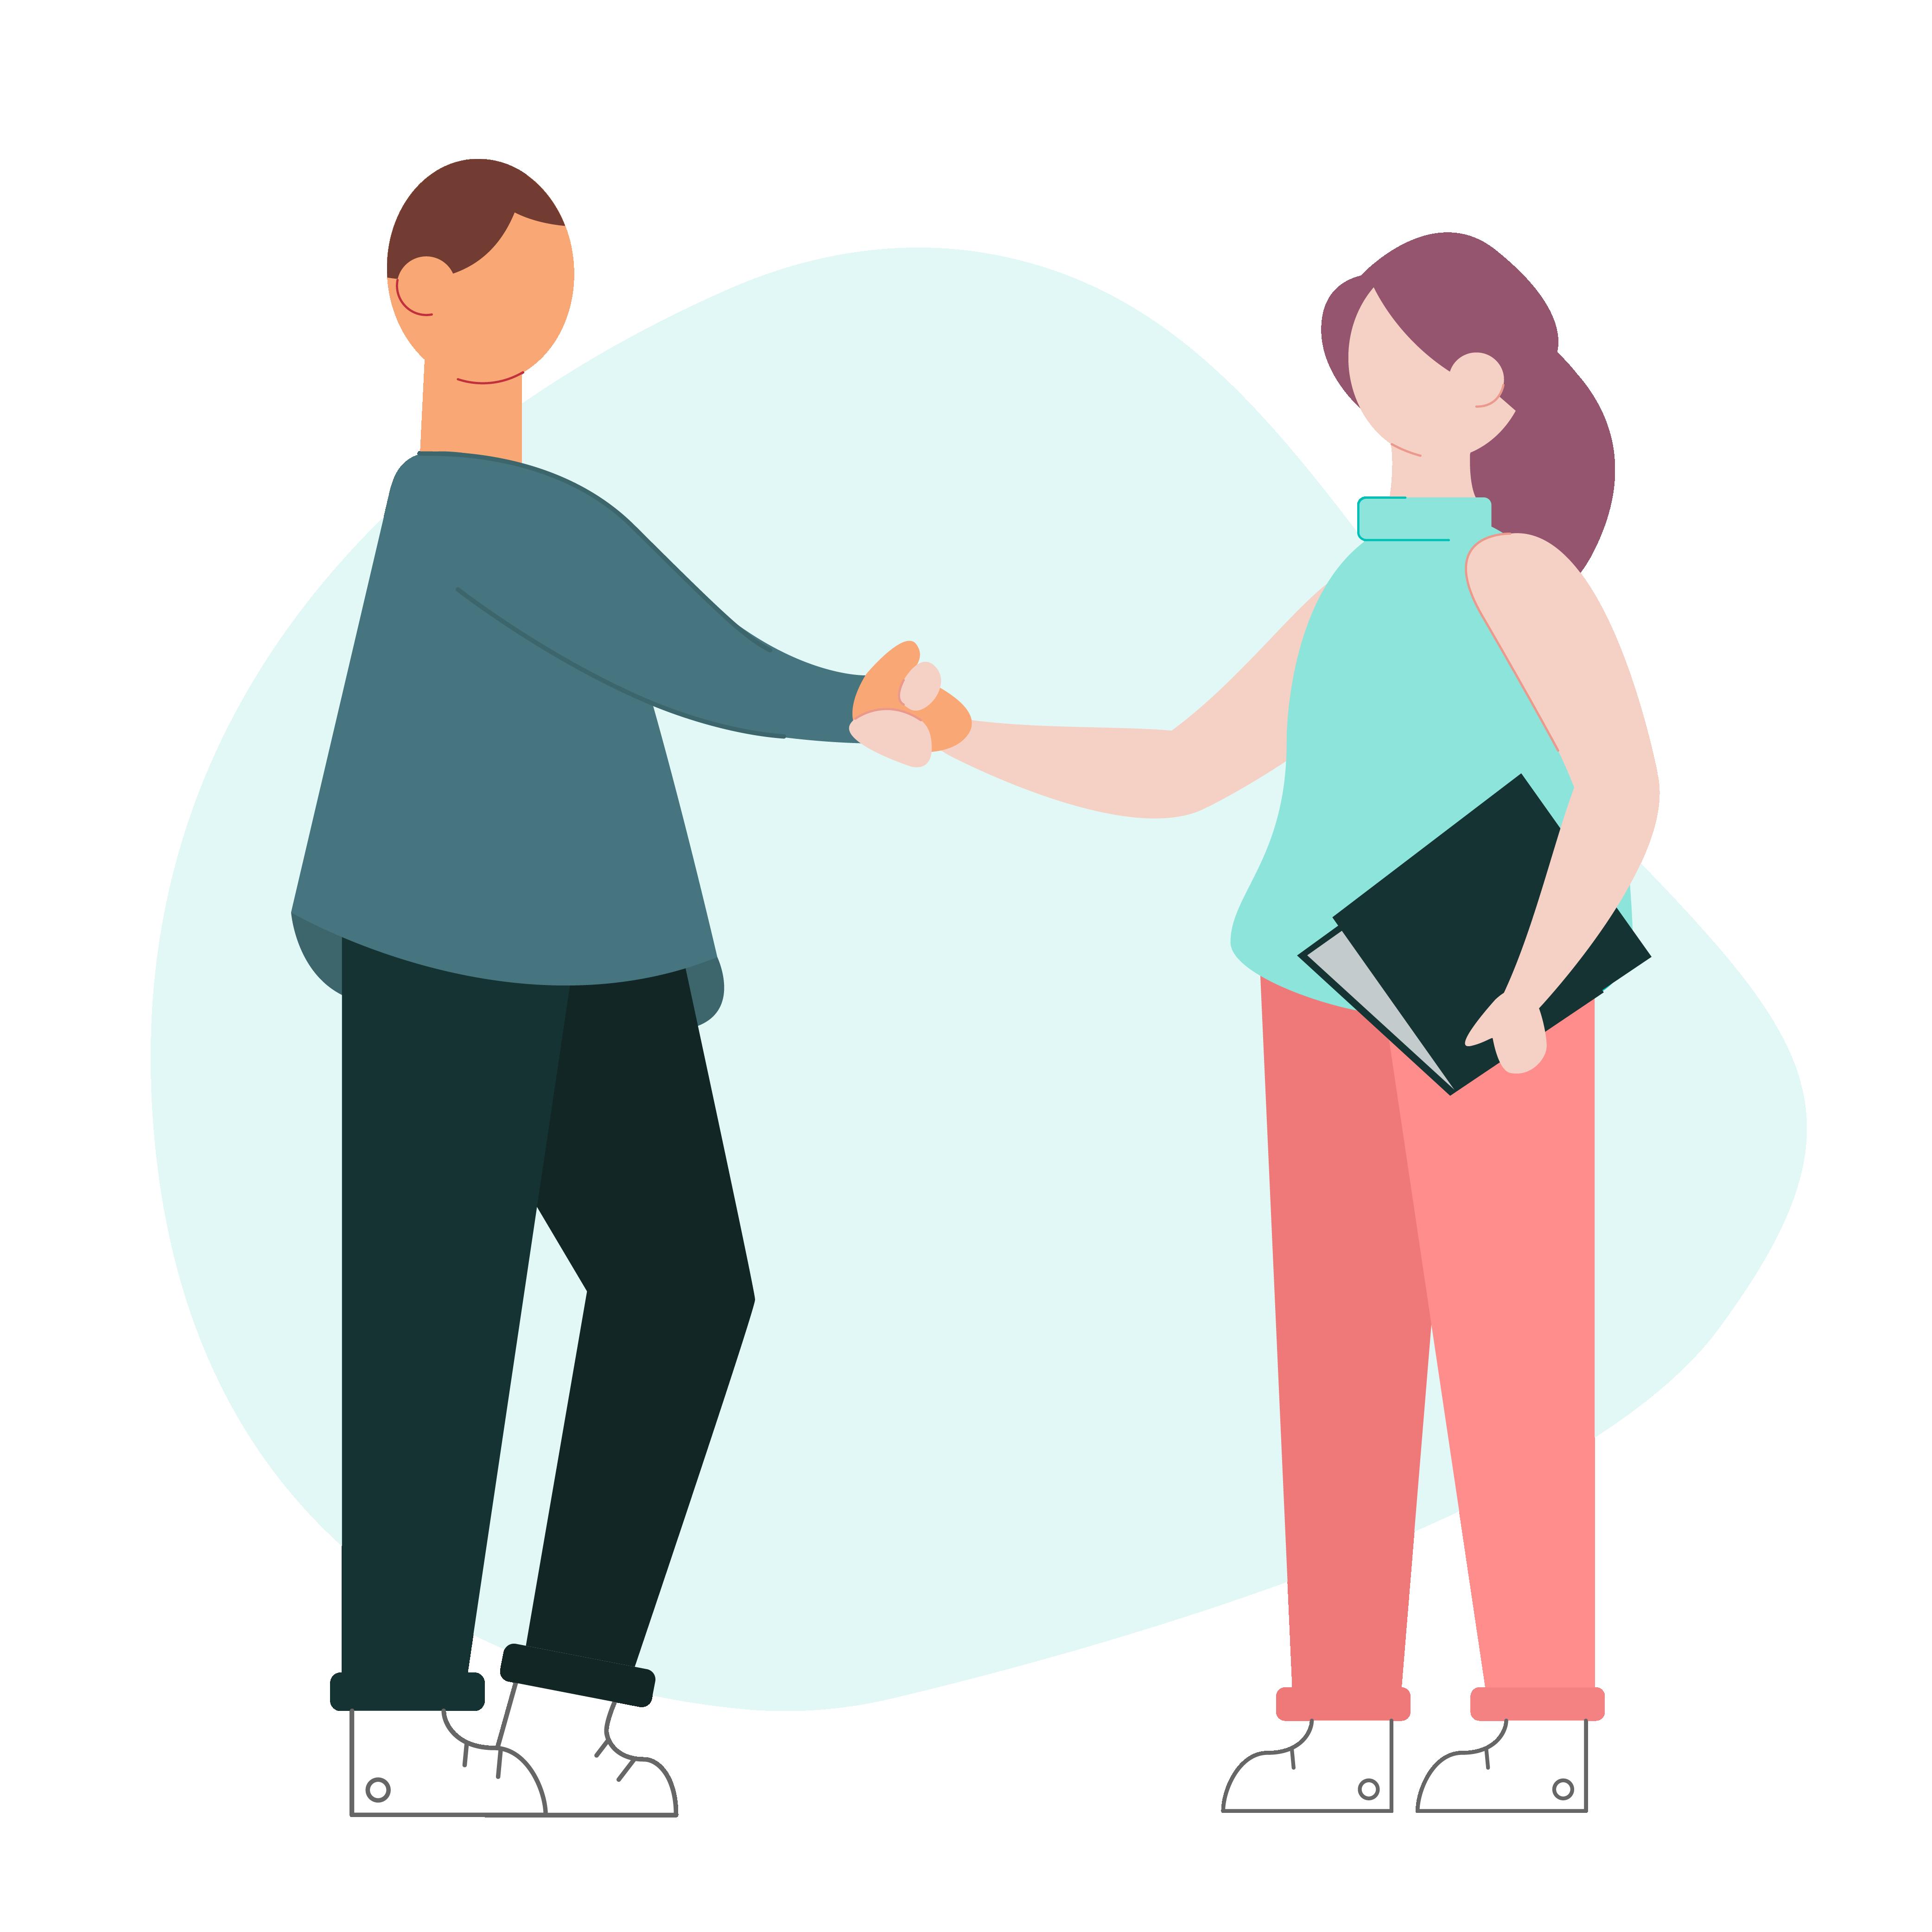 Handshake - Weploy Illustrations 2020